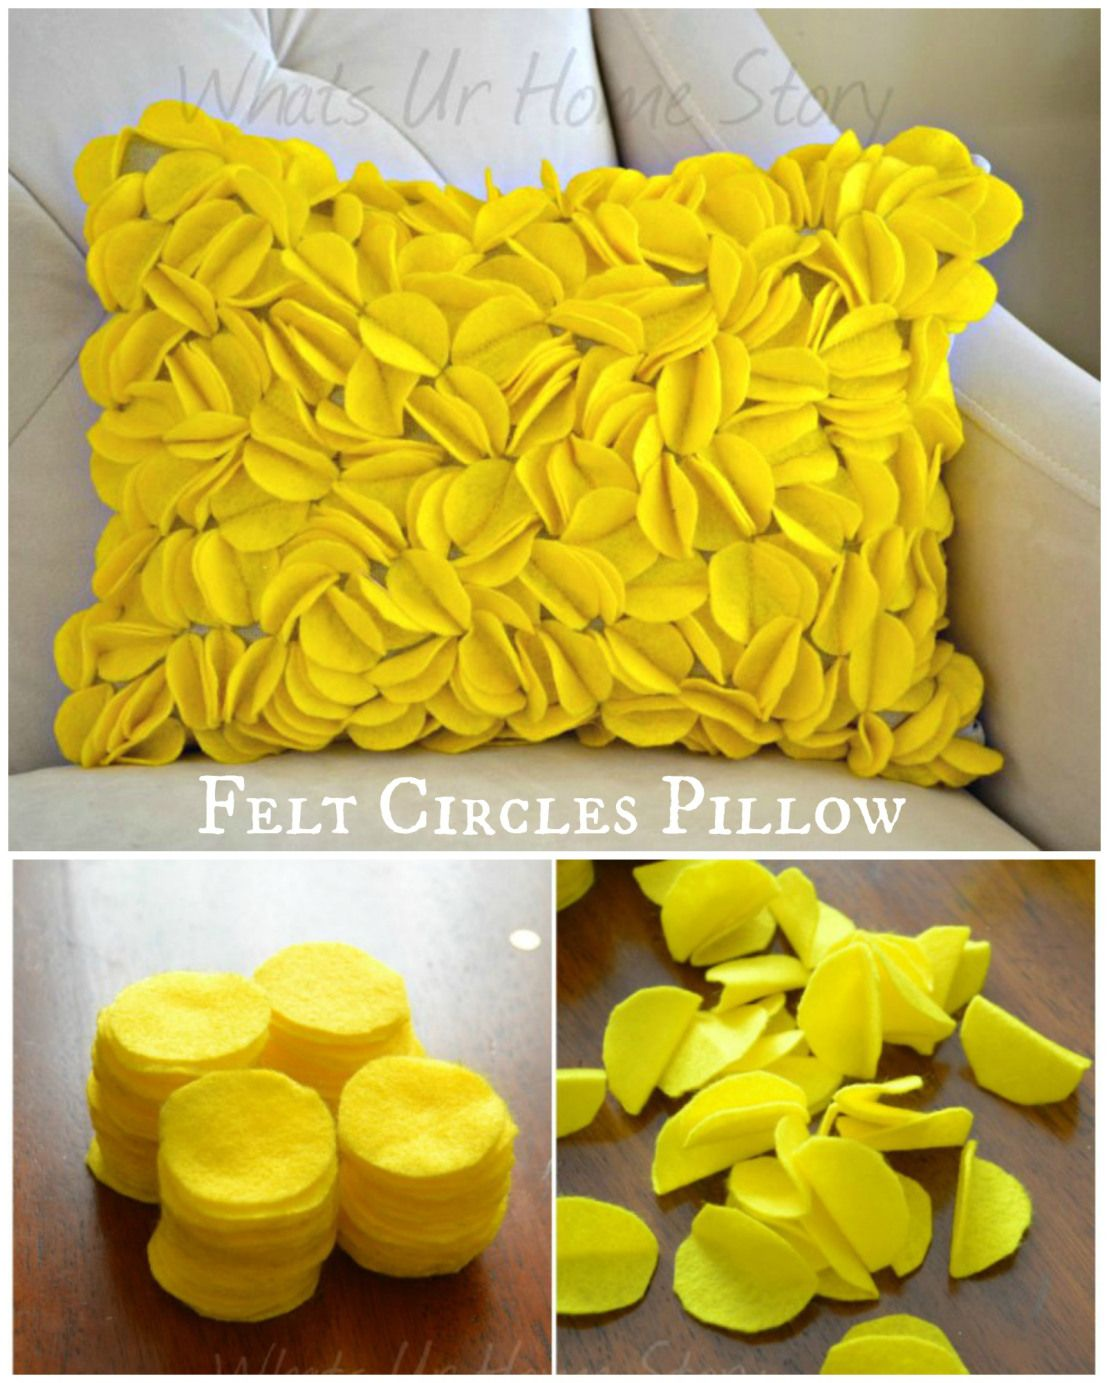 Felt circle pillow pillows tutorials and craft